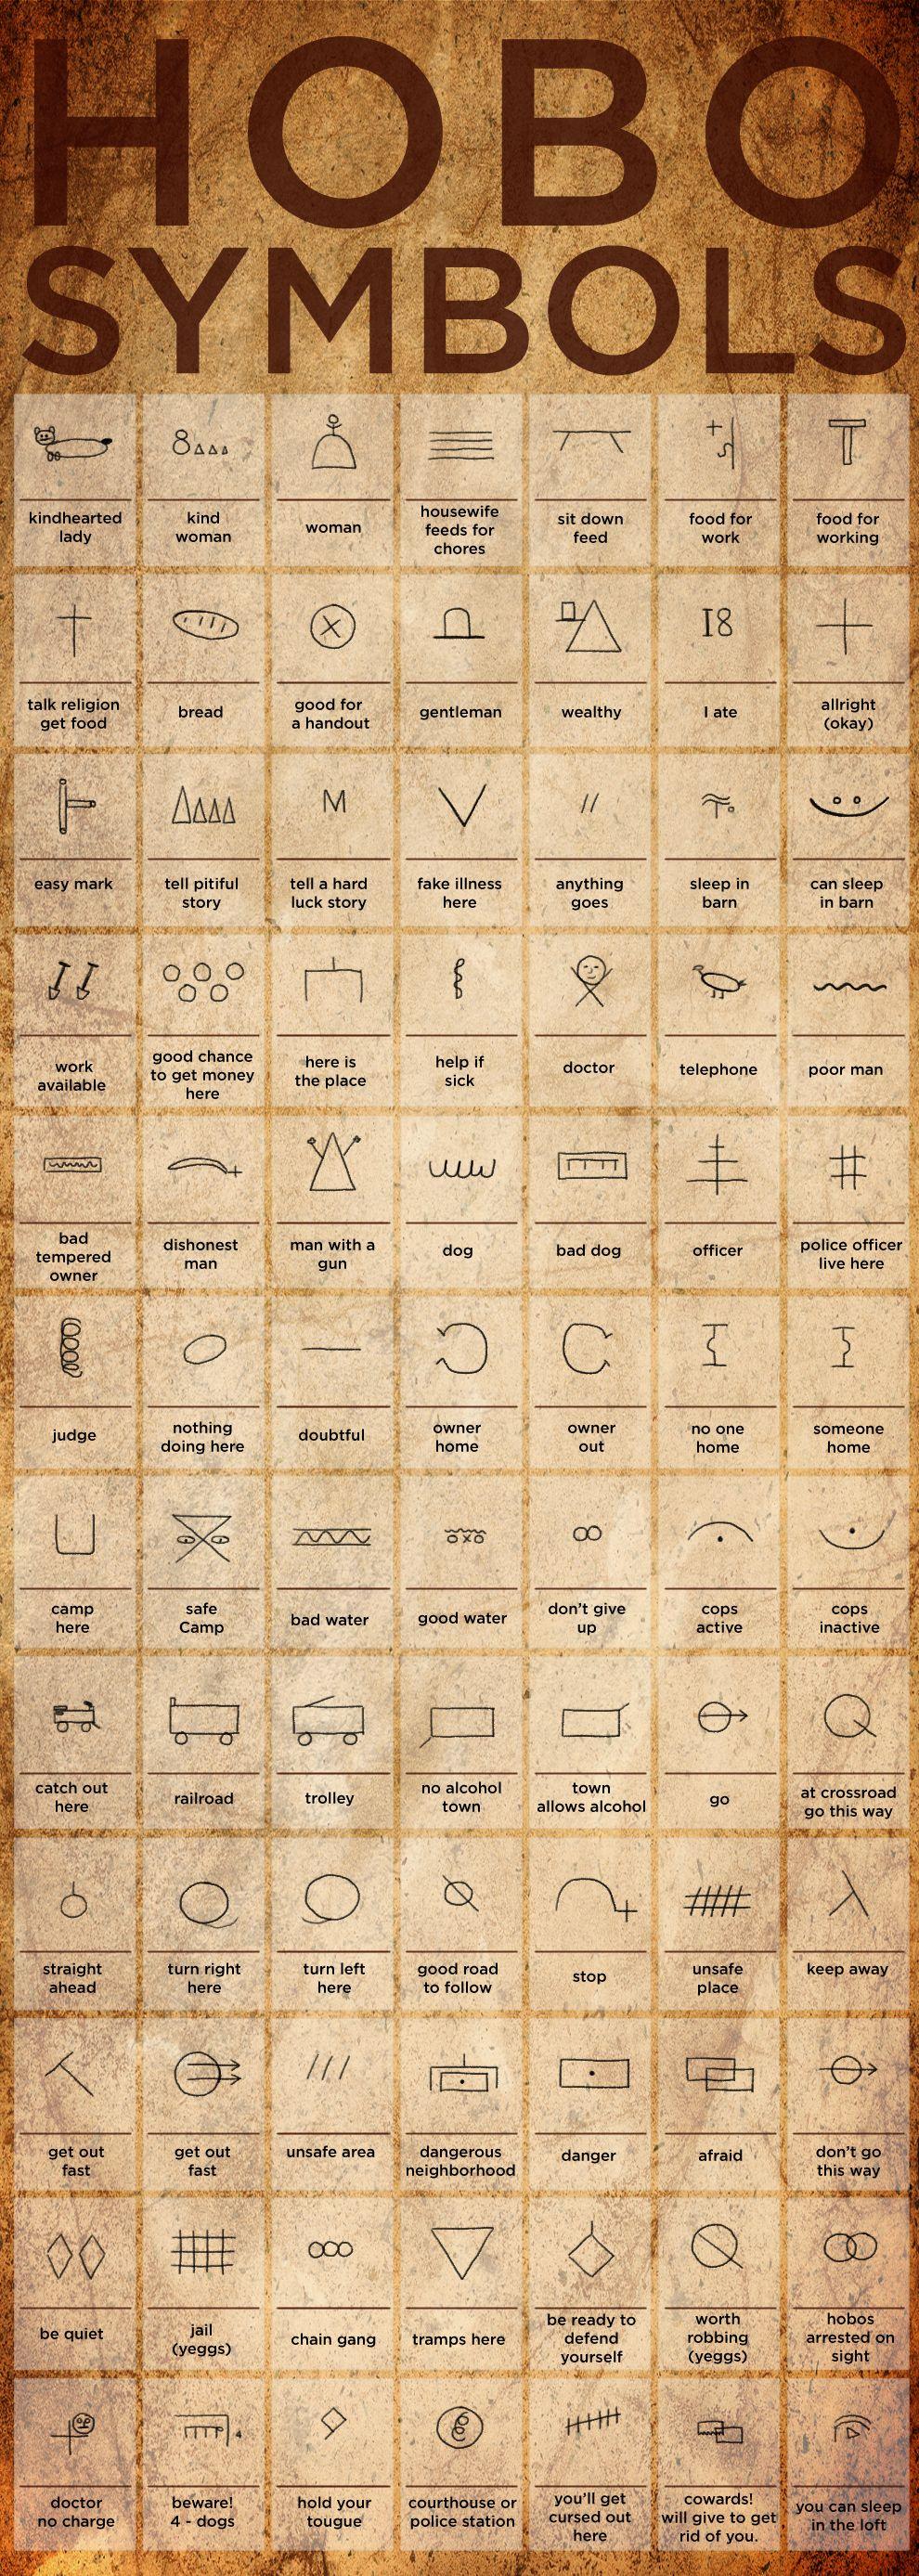 Hobo Symbols History Snapshots Pinterest Symbols August 21